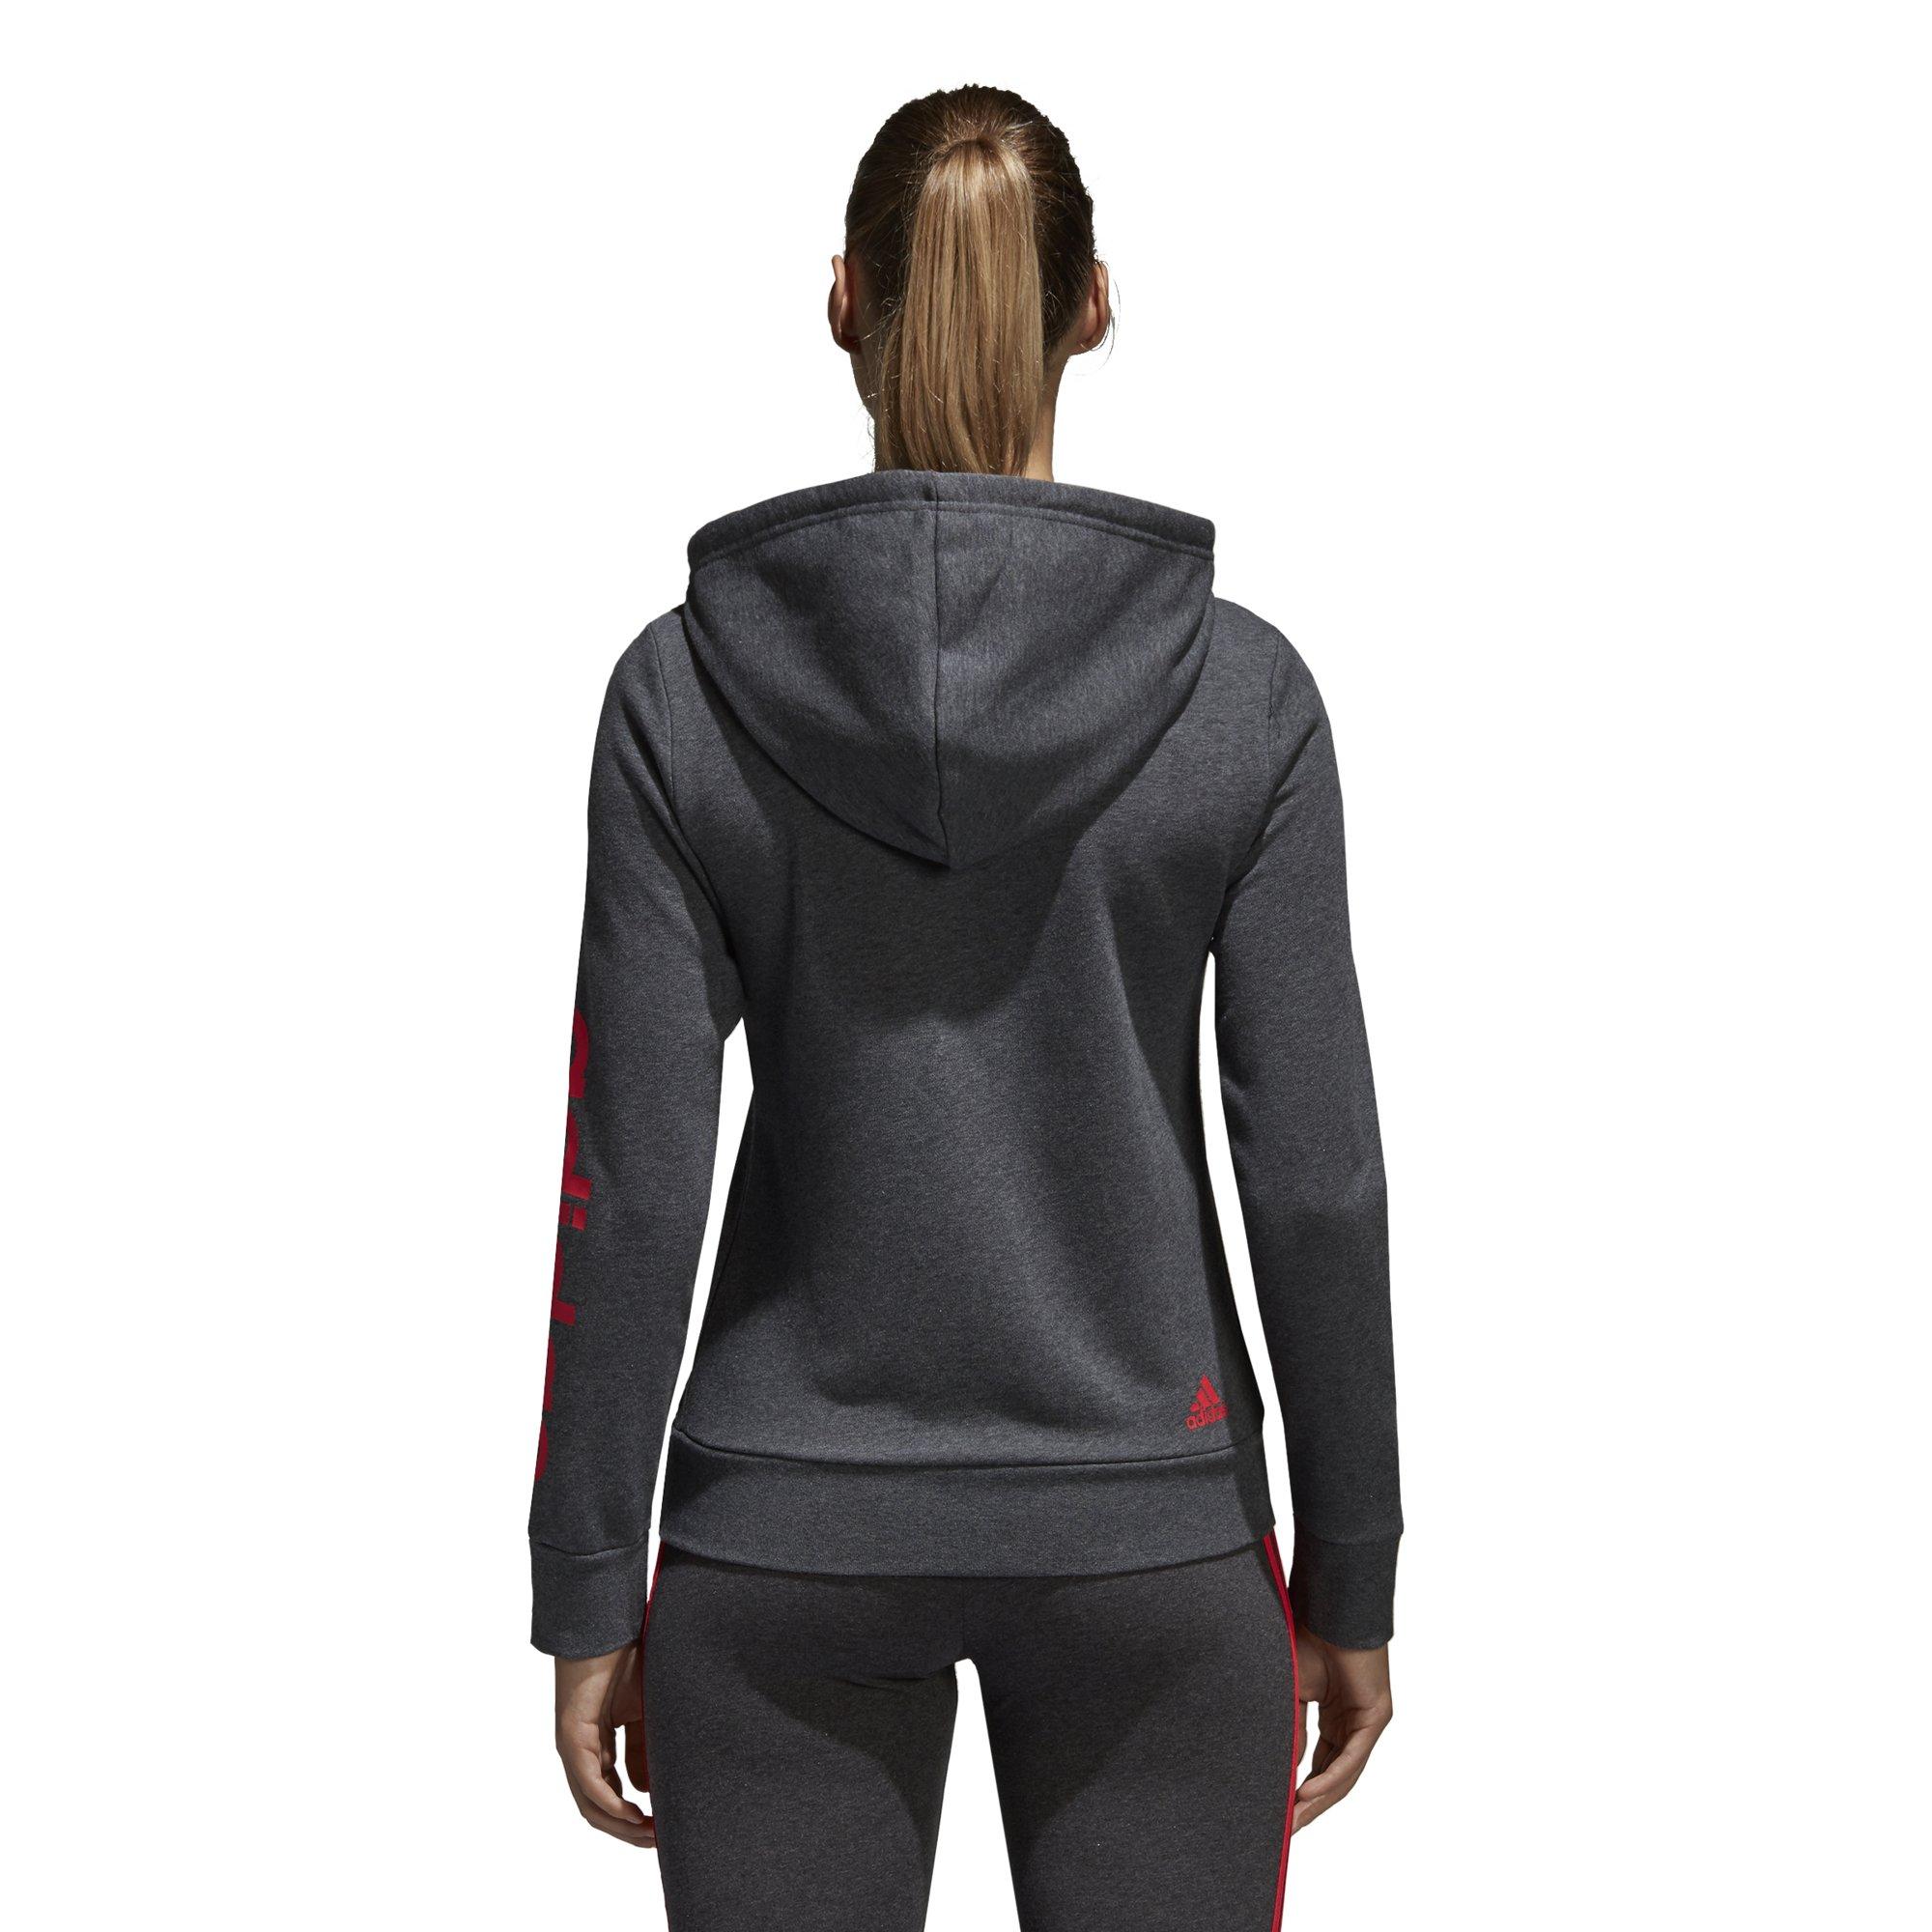 adidas Women's Essentials Linear Full Zip Fleece Hoodie, Dark Grey Heather/Real Coral, X-Small by adidas (Image #4)